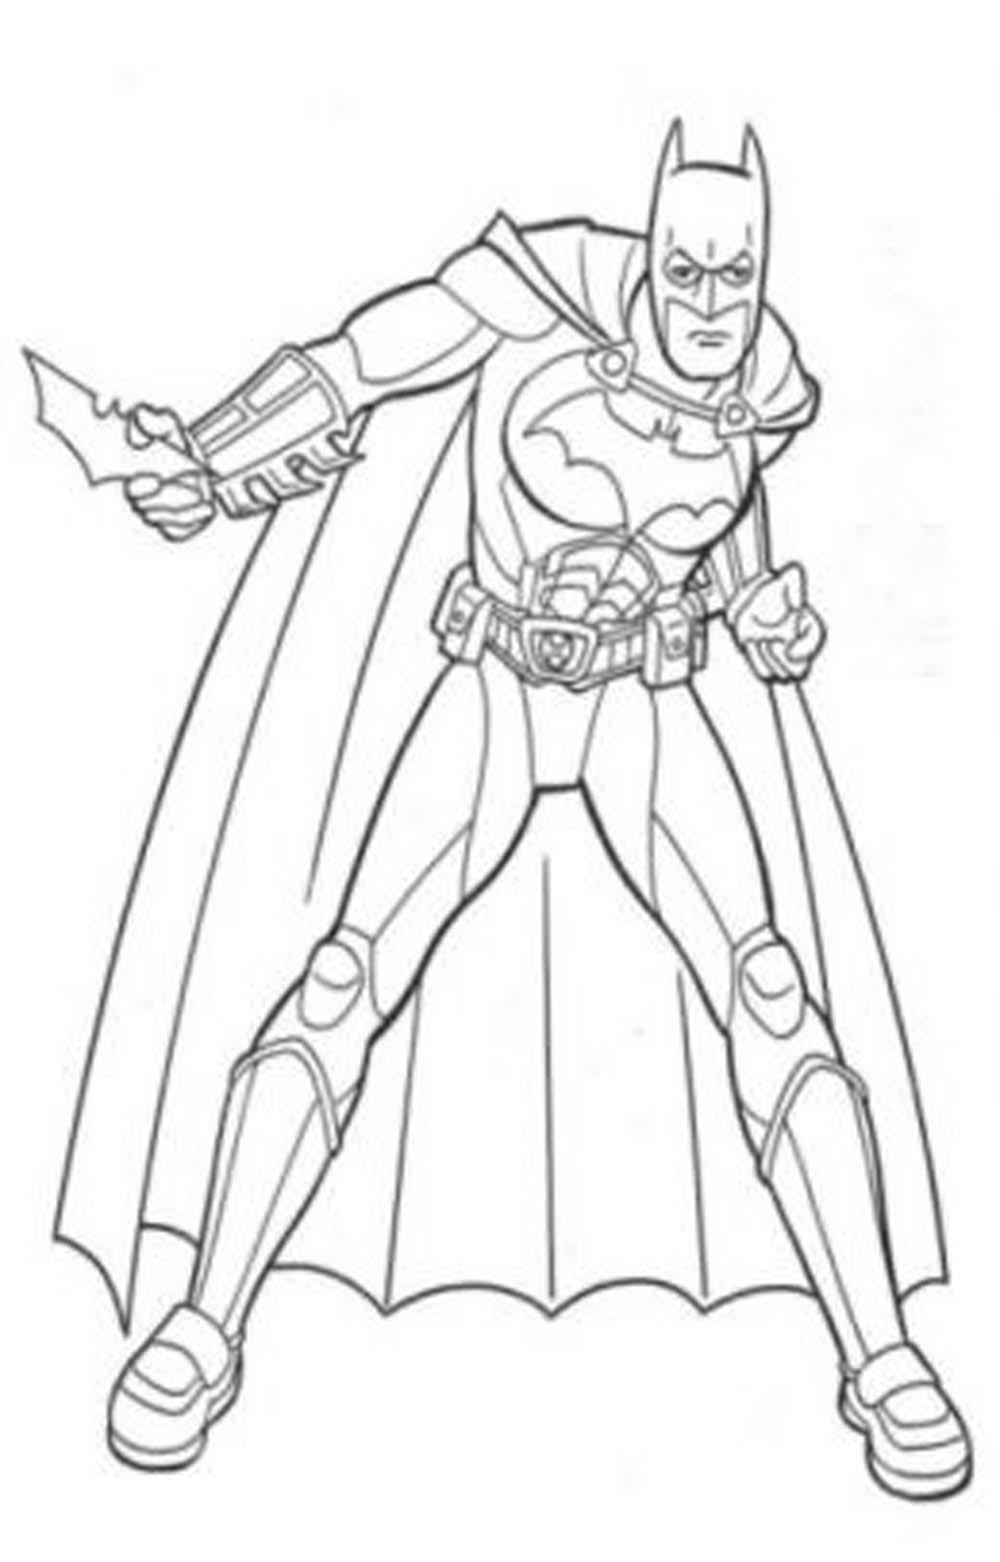 printable pictures of batman batman coloring pages google search super heroes of pictures printable batman